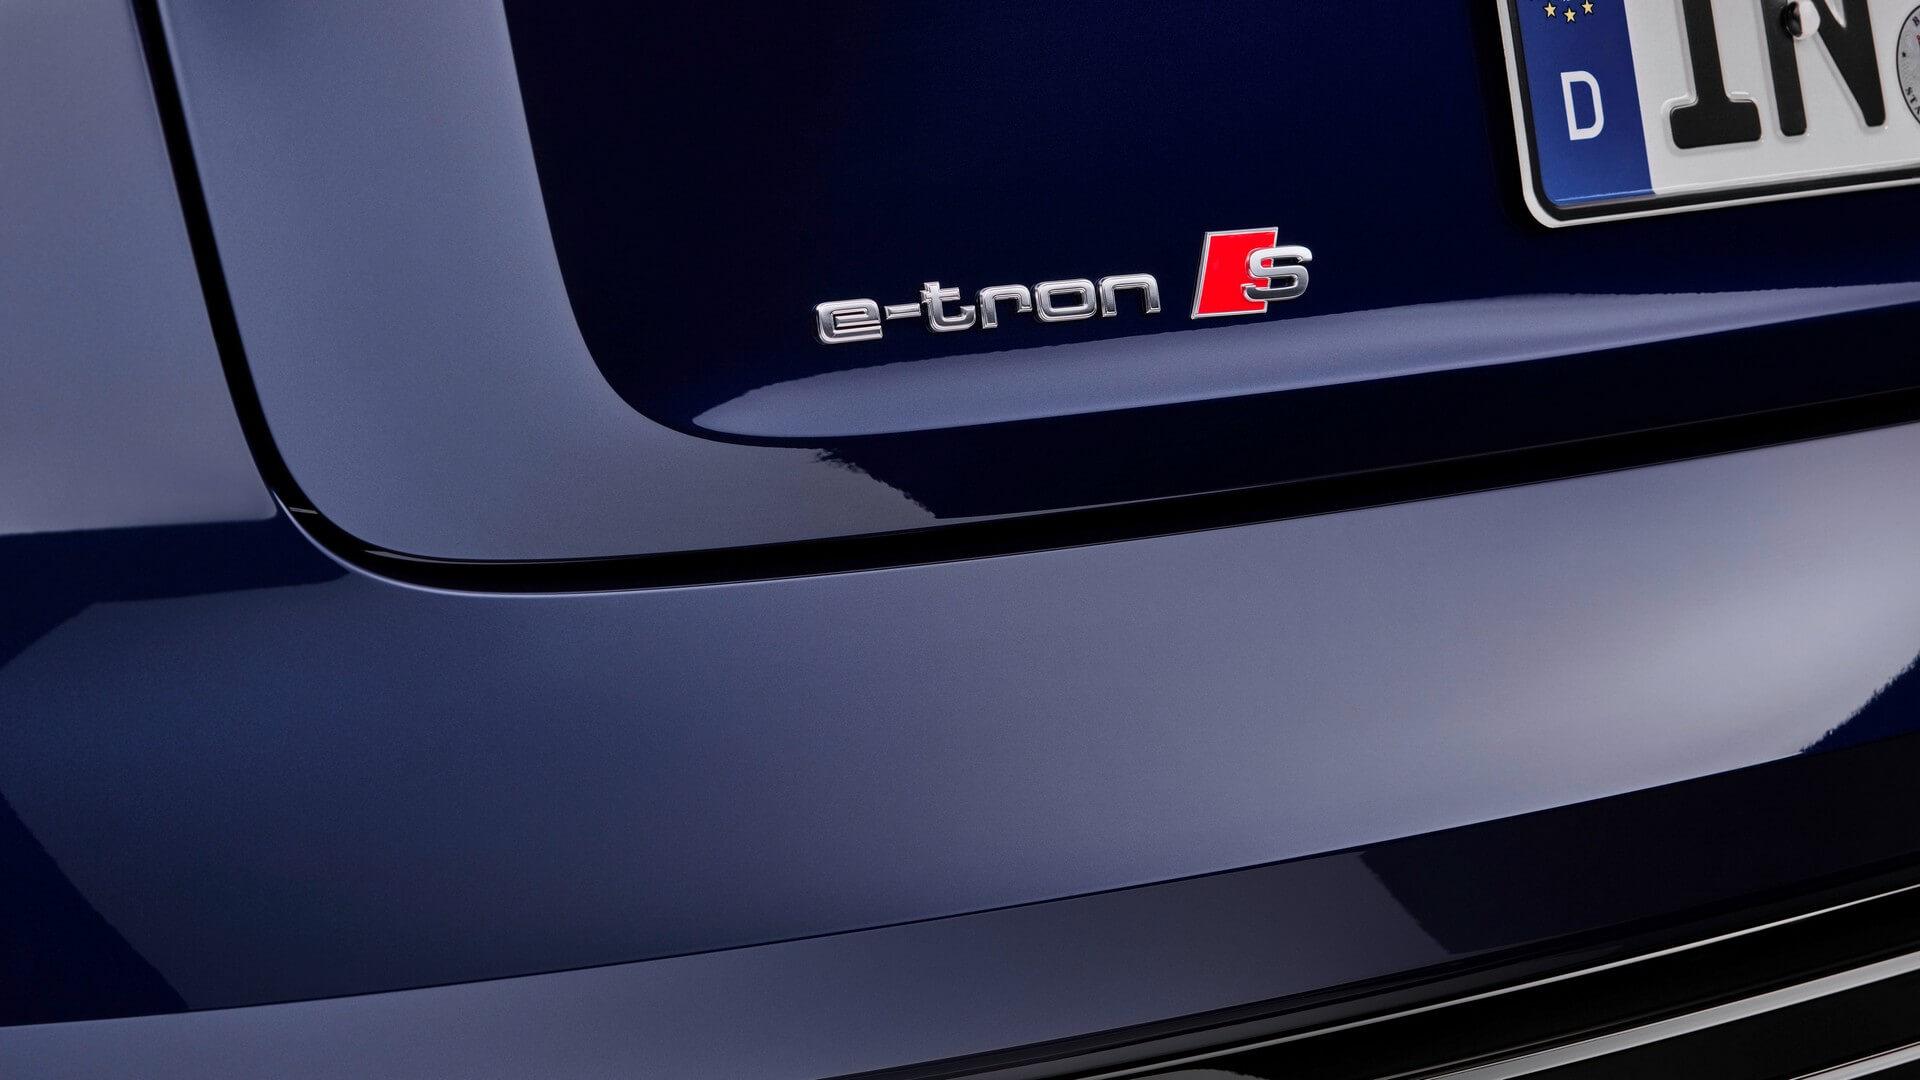 Audi-E-Tron-S-and-E-Tron-S-Sportback-2020-110